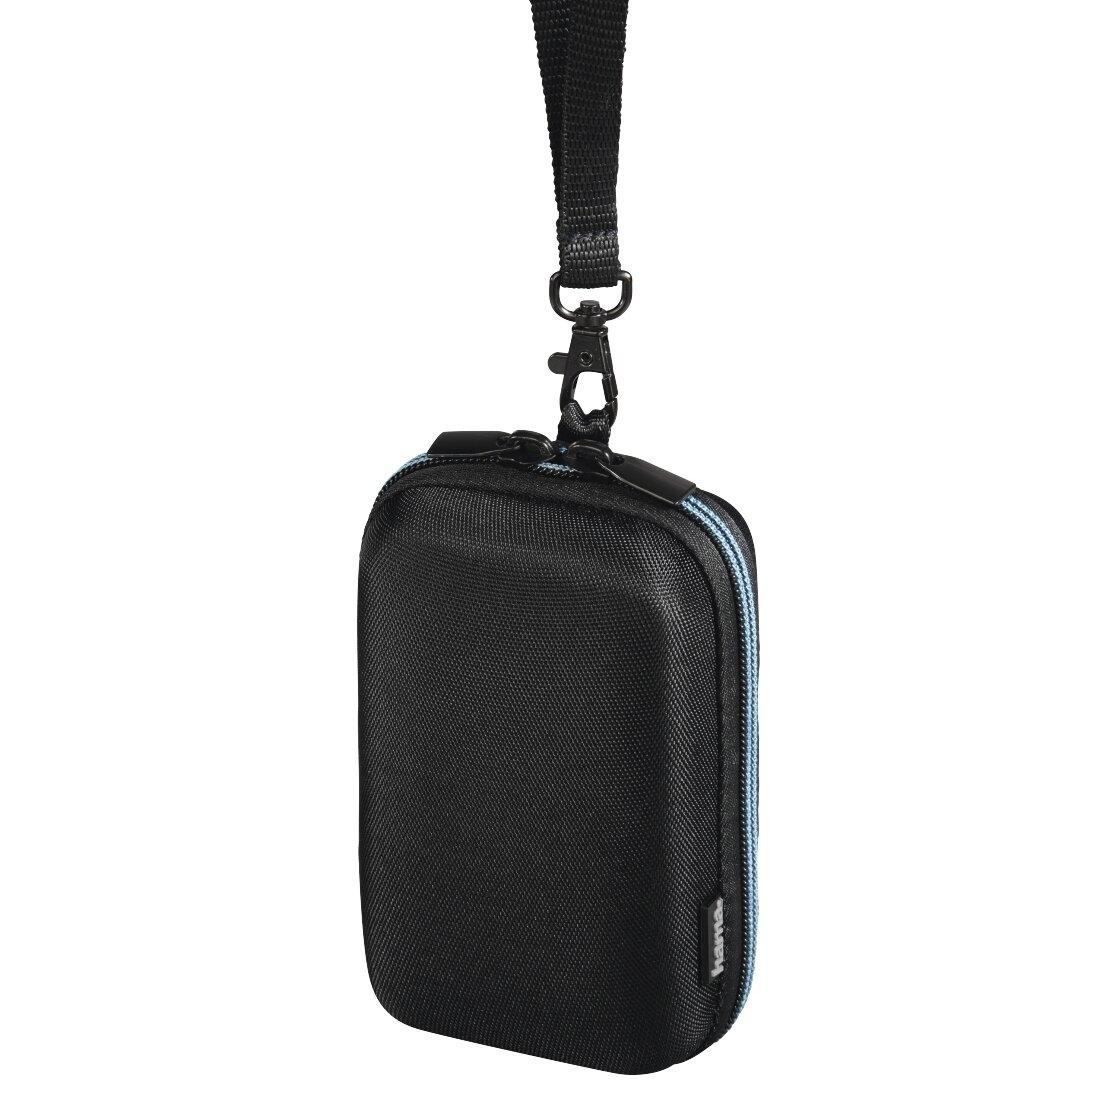 Hama Tasche Hardcase Zip 80M schwarz/blau